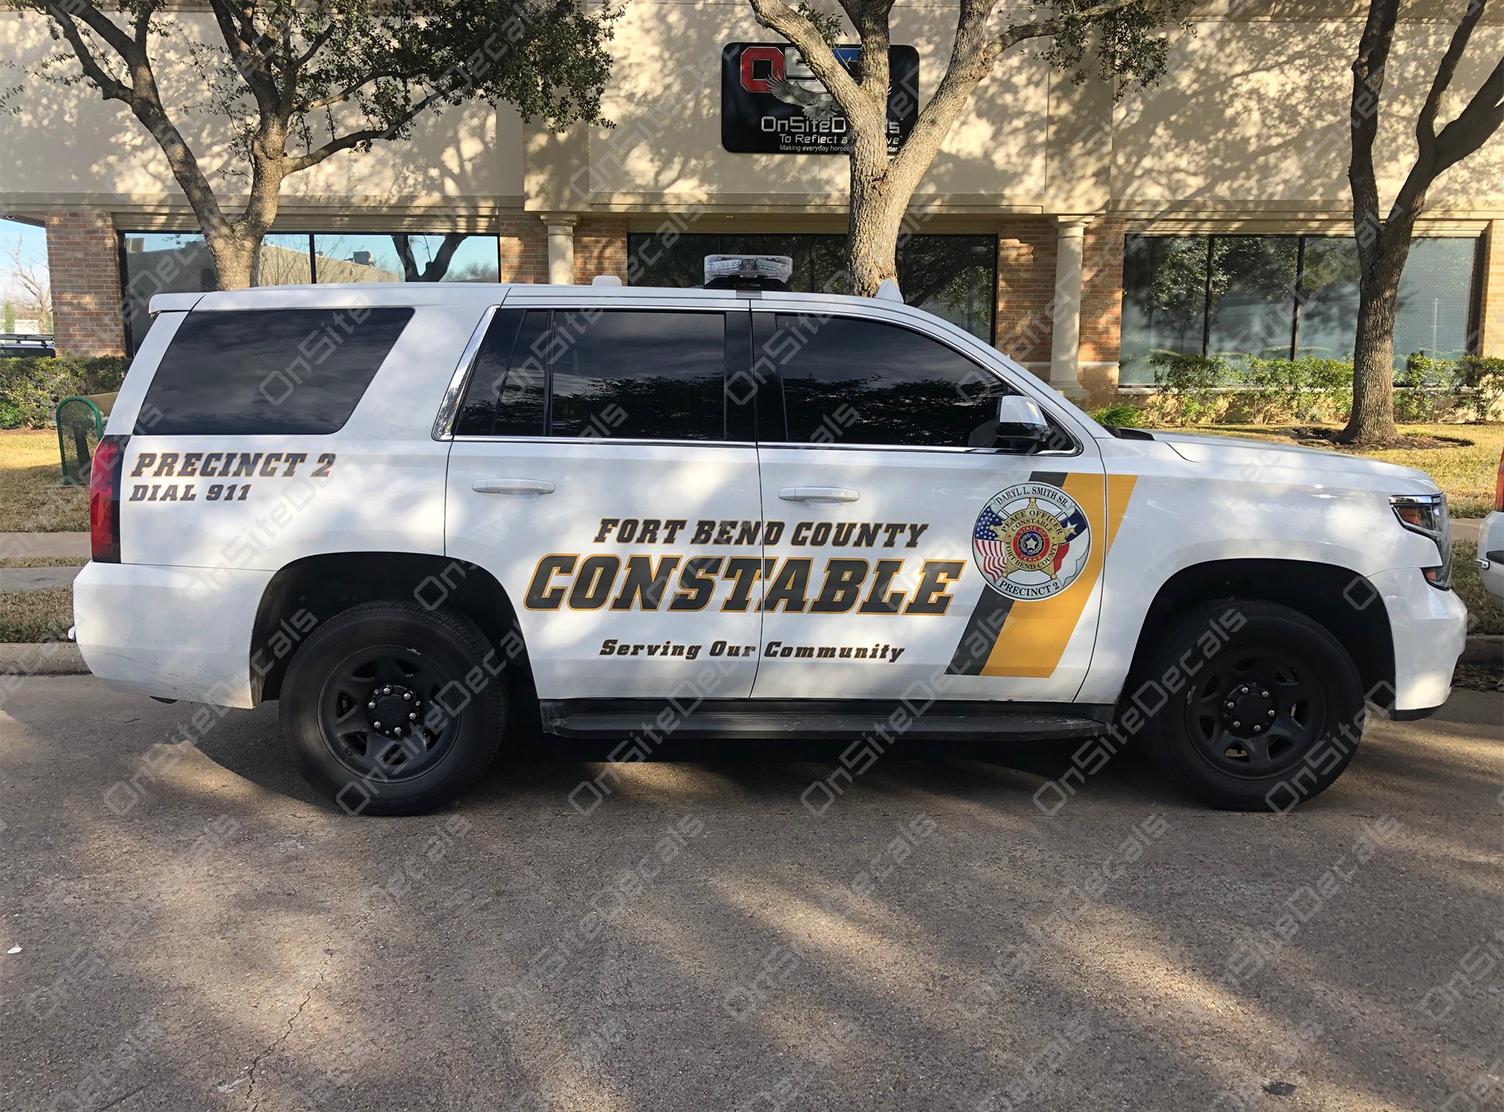 fbc-constable-pct-2.png